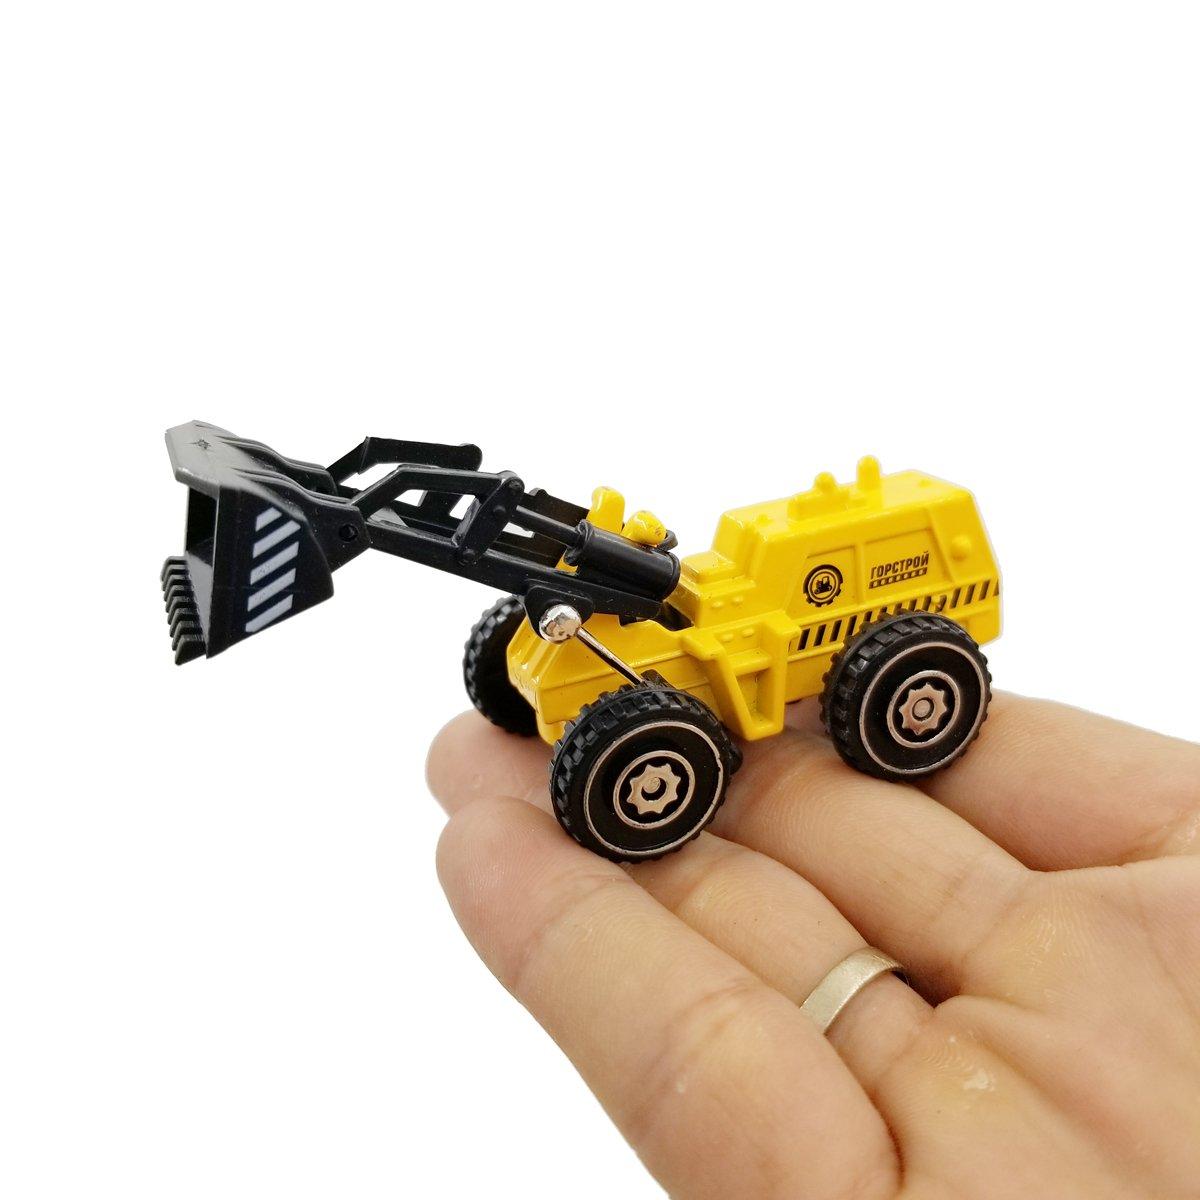 Clay truck Excavating trucks Bulldozers Dump trucks M-jump 5 PCS Mini 1:72 Scale DIE-CAST Metal Construction Engineering Vehicle Toys Set for kids Truckshovel